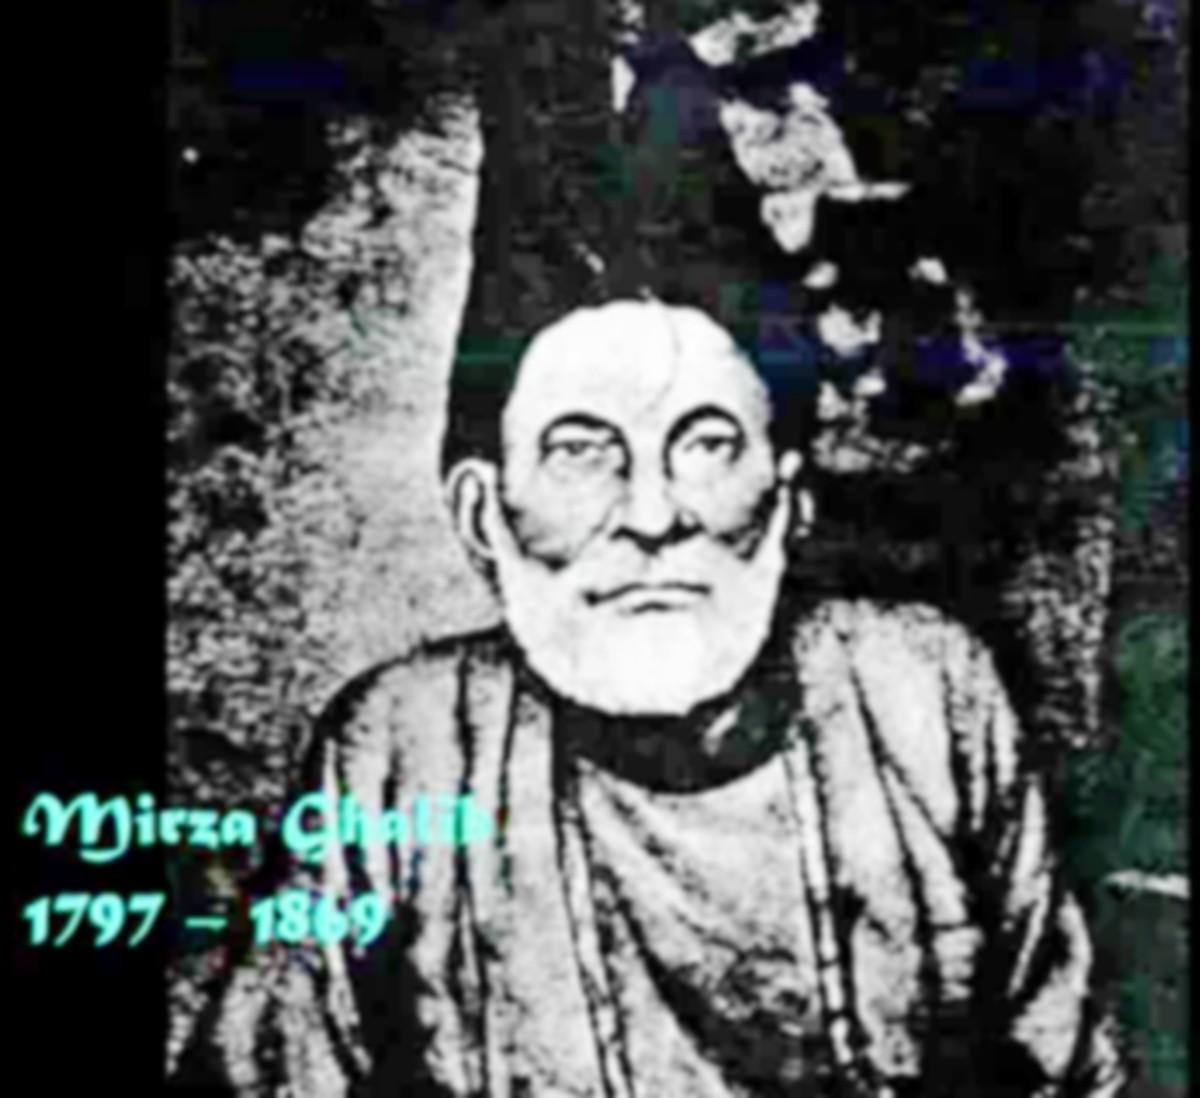 Mirza Ghalib: The greatest ghazal writer